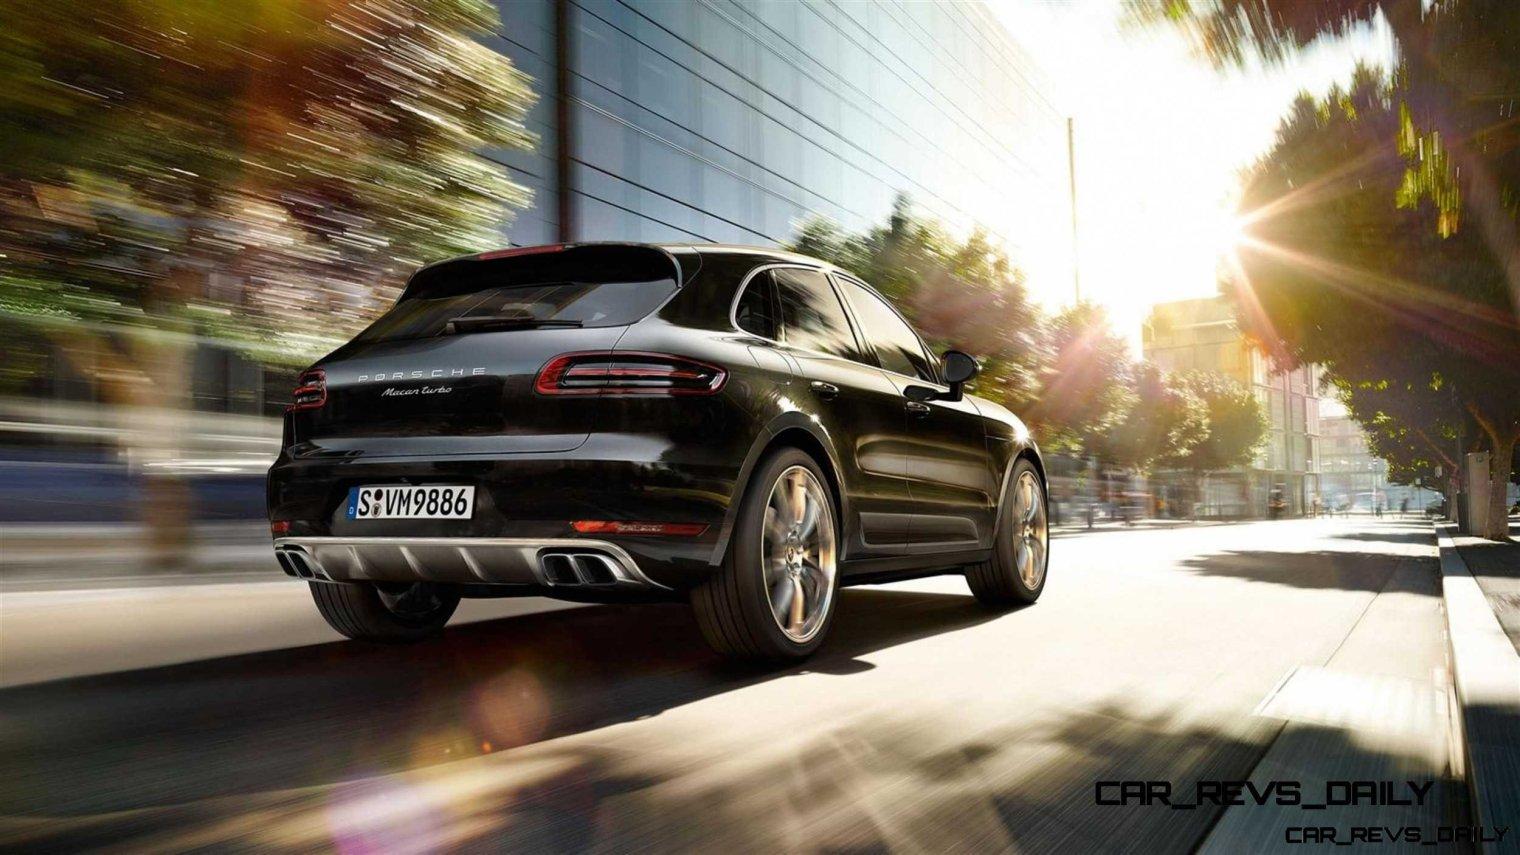 2015 Porsche Macan - Latest Images - CarRevsDaily.com 24